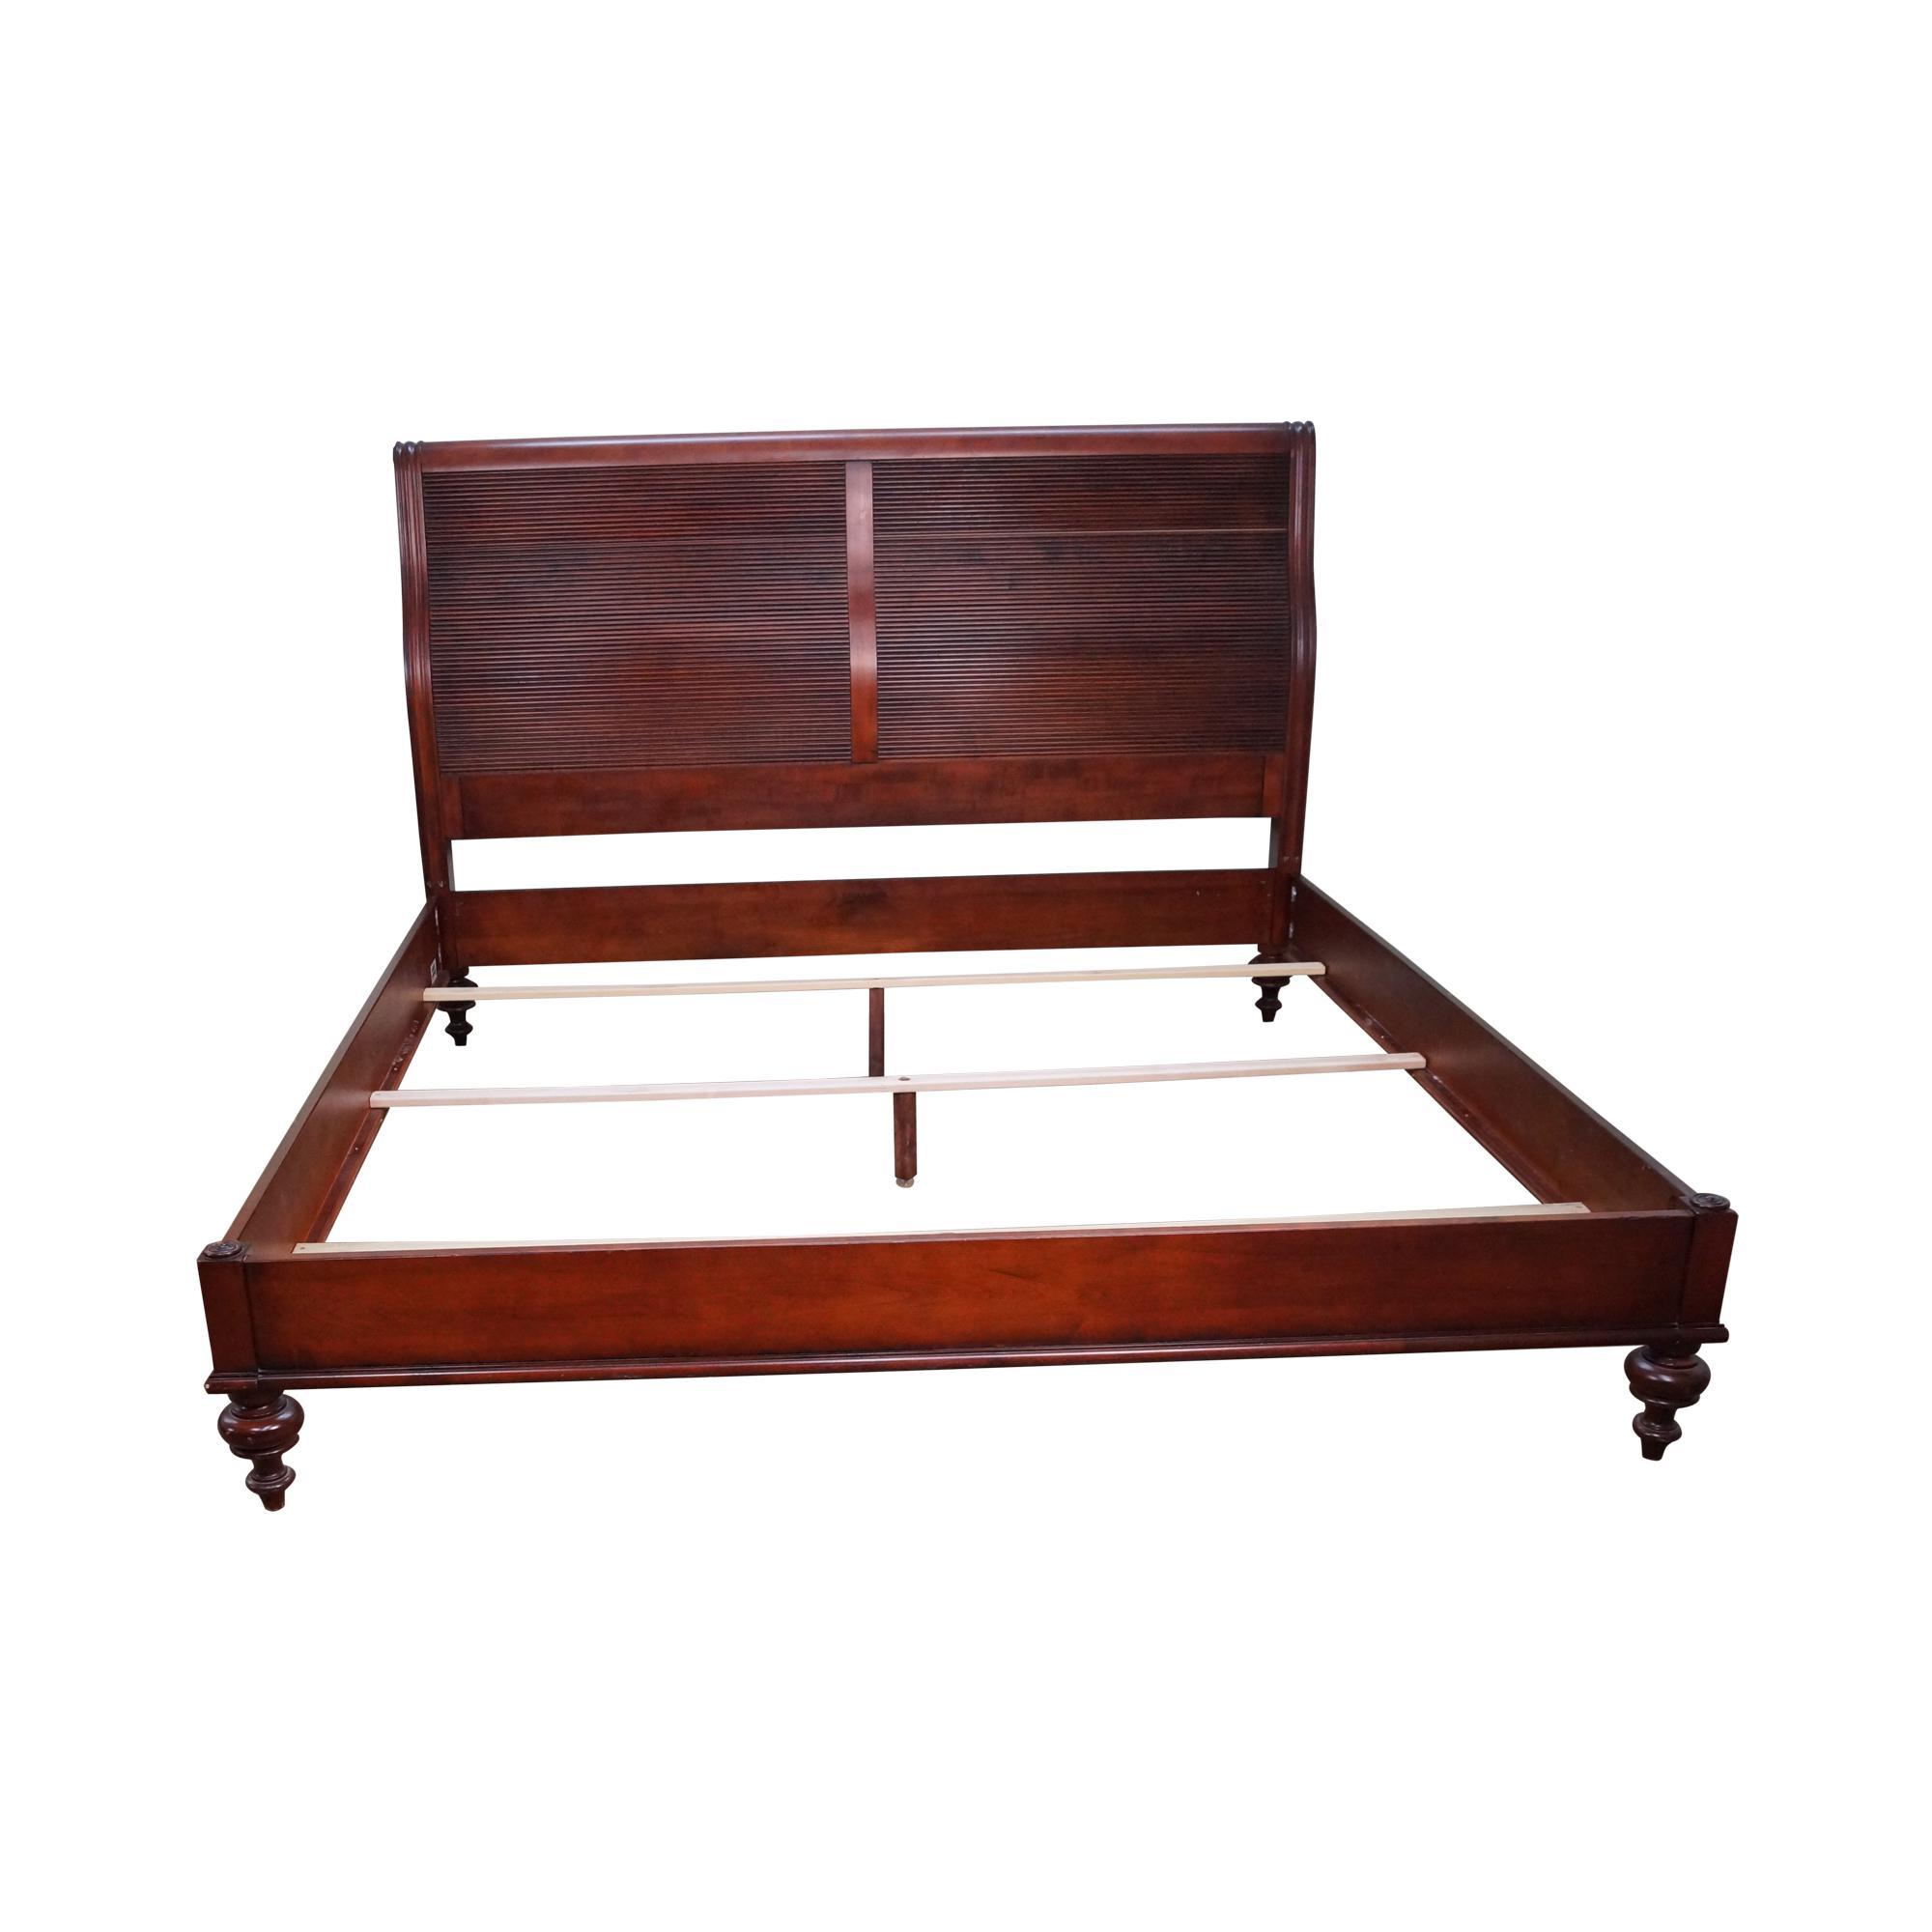 Ethan allen british classics king size kingston bed chairish for Ethan allen king size beds